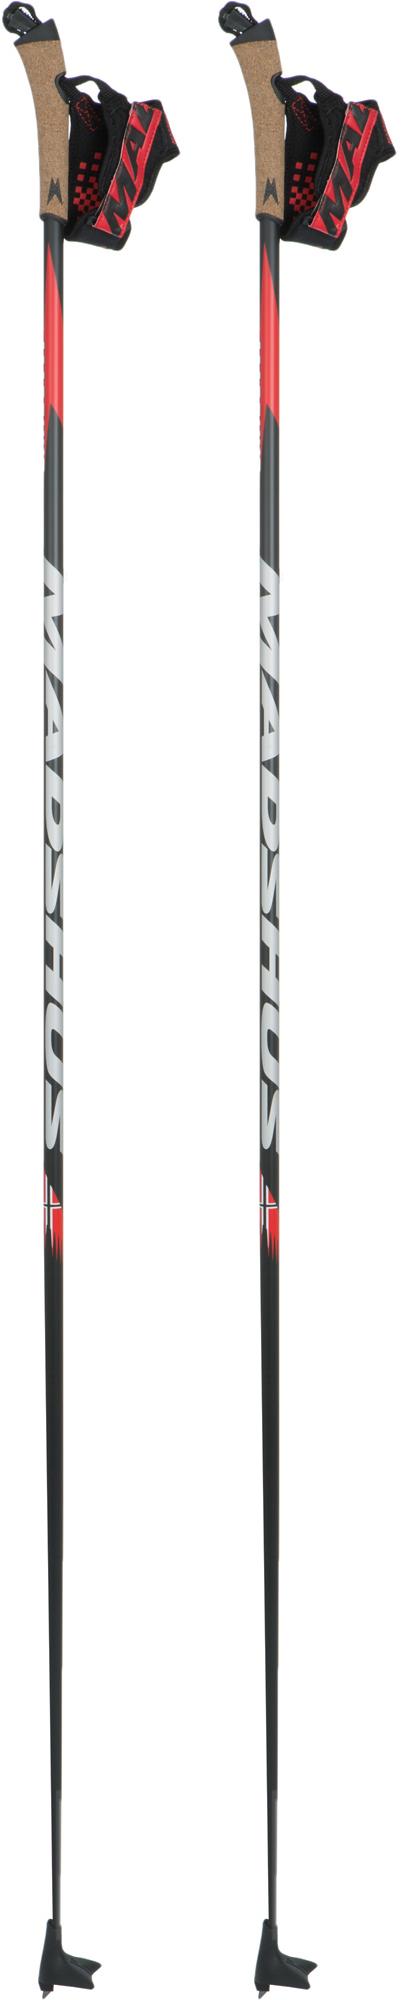 Madshus Палки для беговых лыж CR40